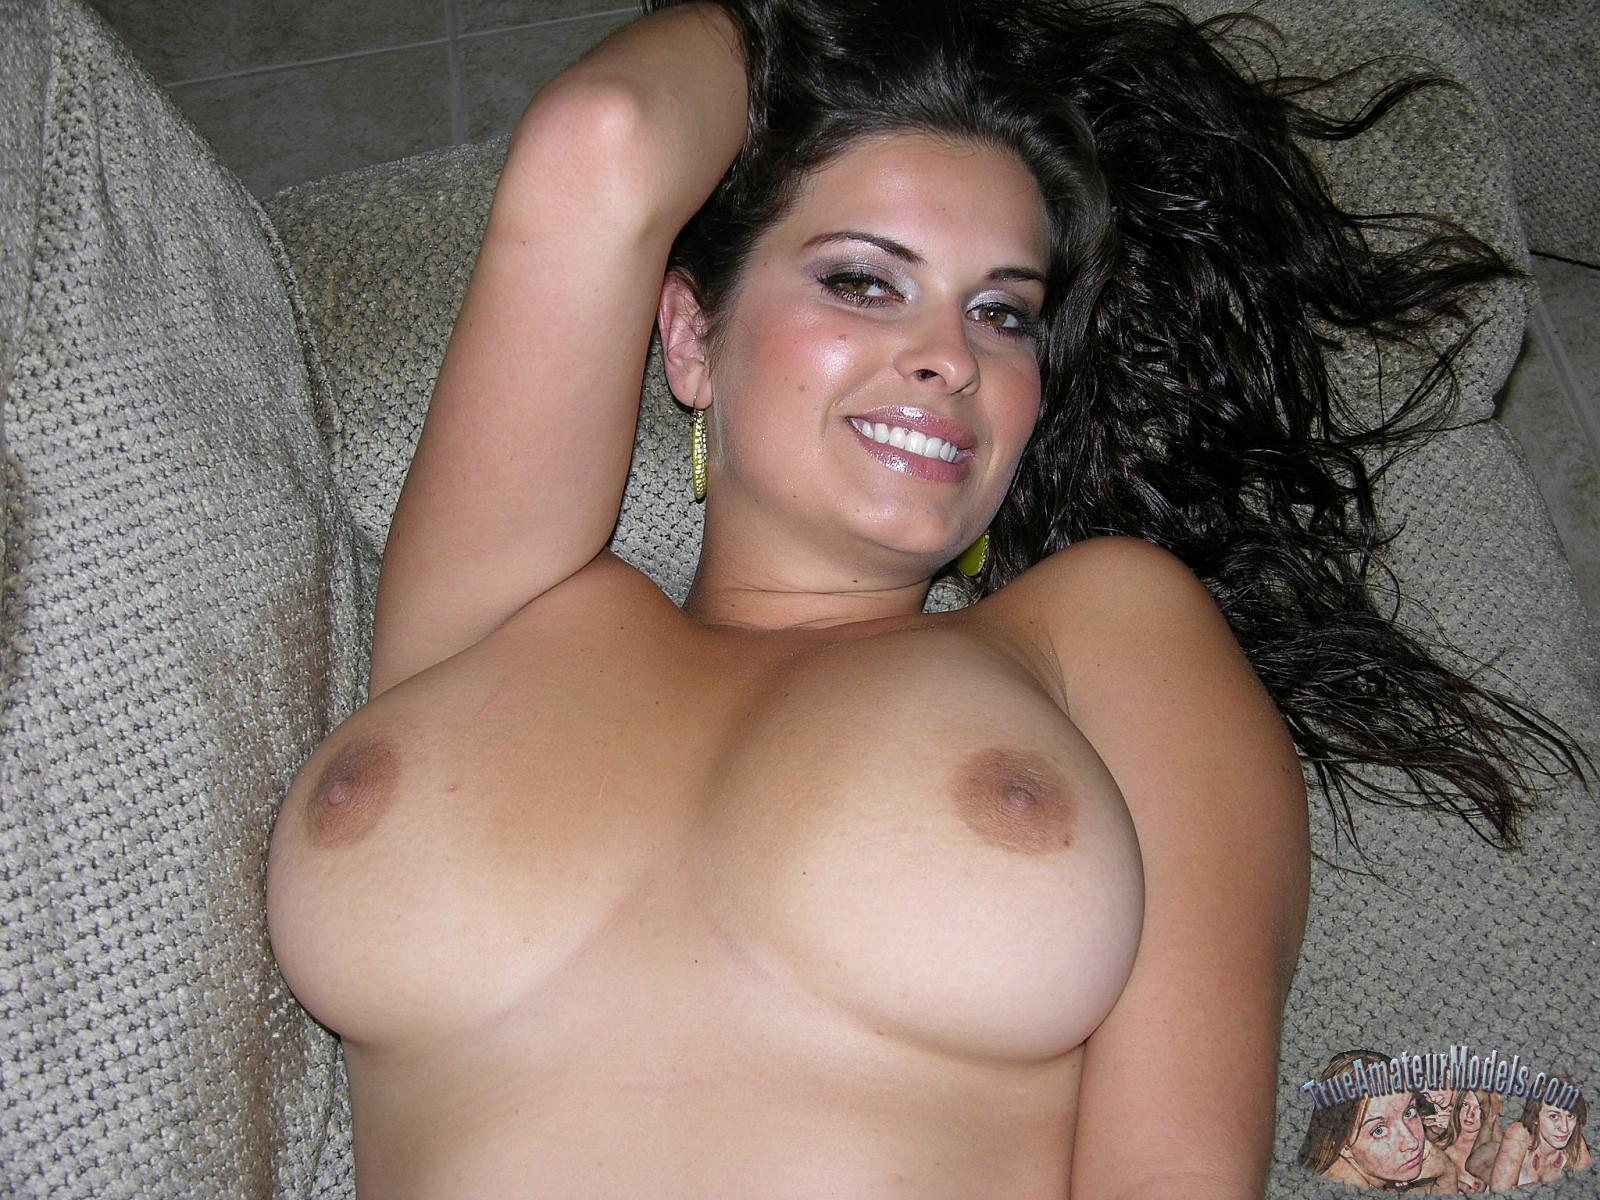 Busty amateur women tits